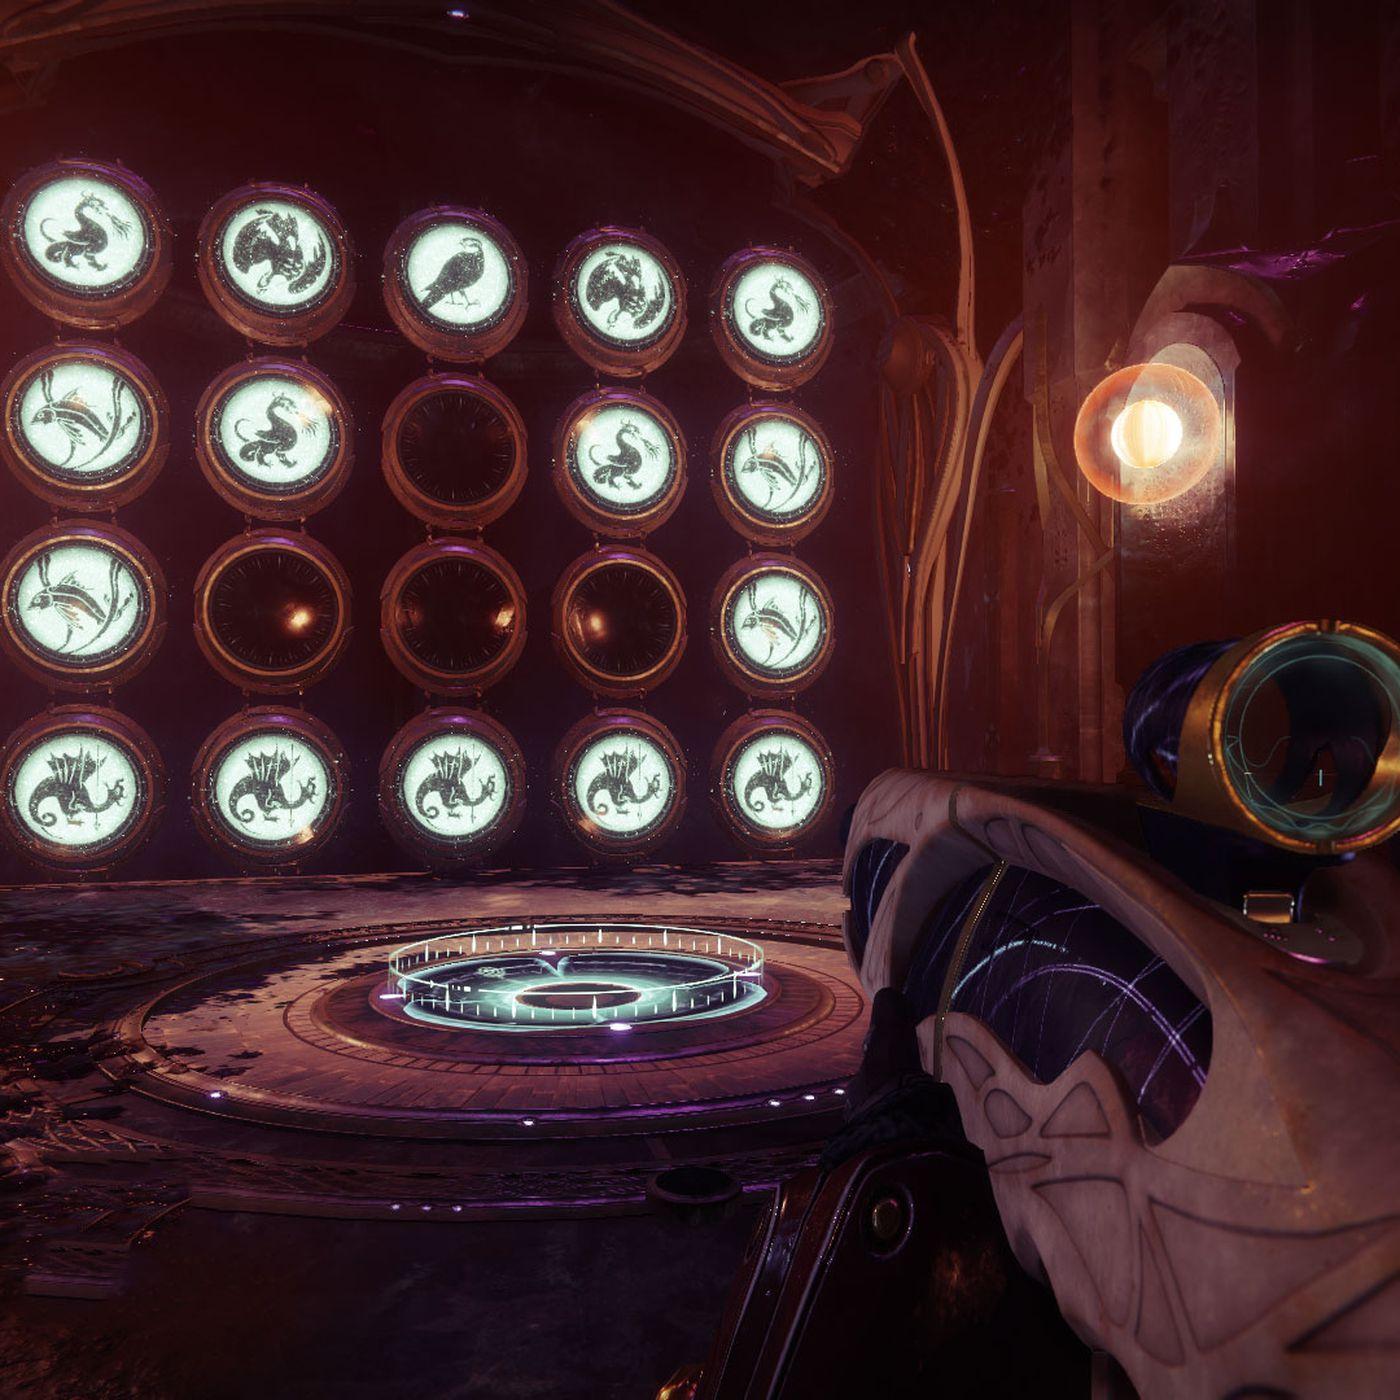 Destiny 2: Forsaken: How to make wishes in the Last Wish